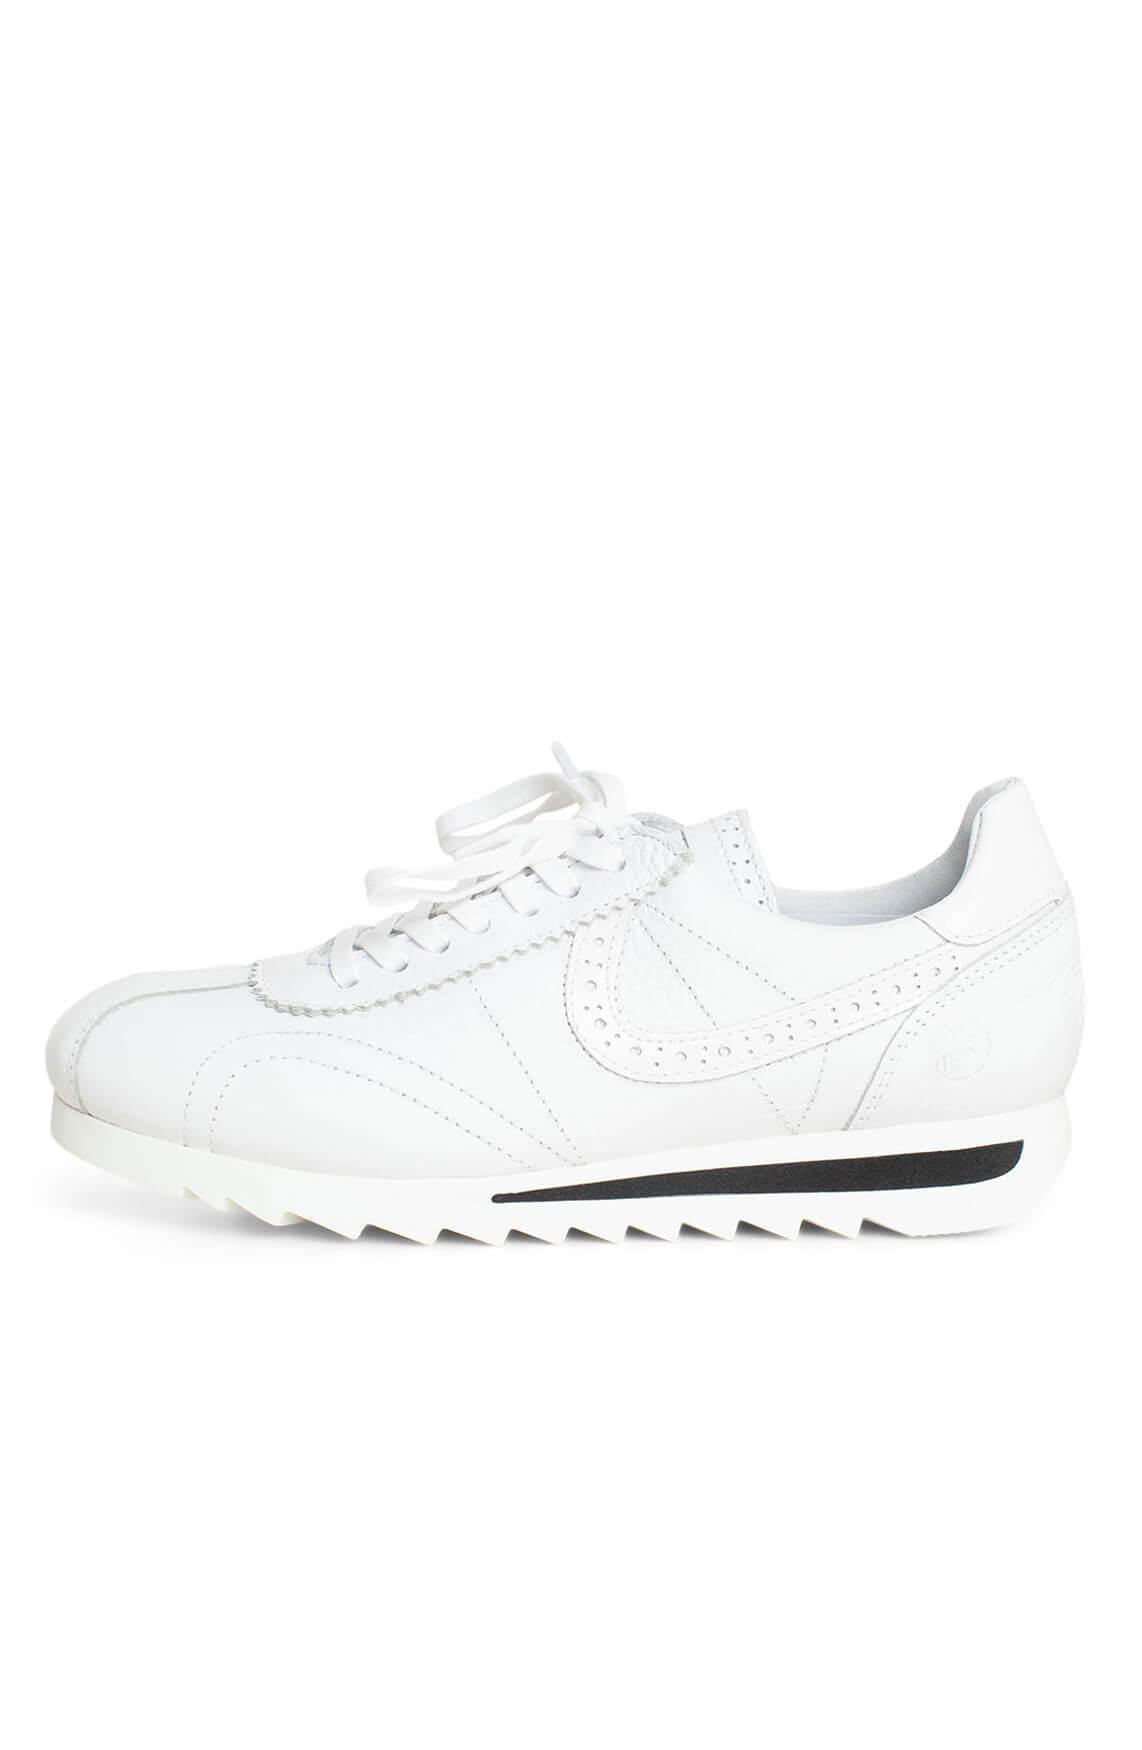 Post XChange Dames Sneaker Wit